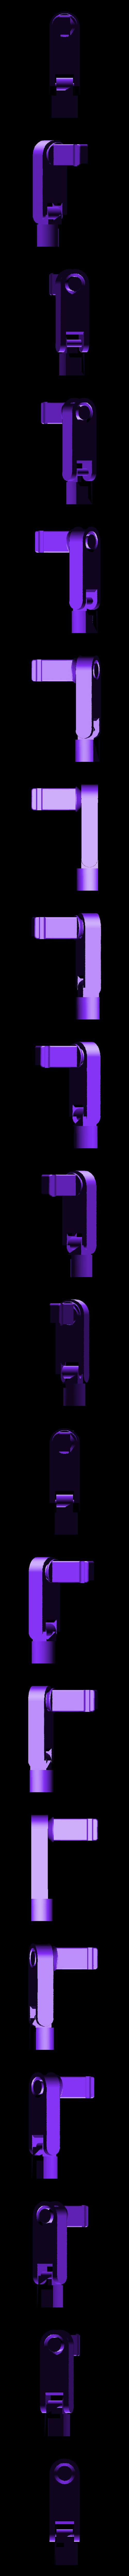 CSS-crank-handle.stl Download free STL file Hand Crank Solder Dispenser • 3D printable design, Adafruit